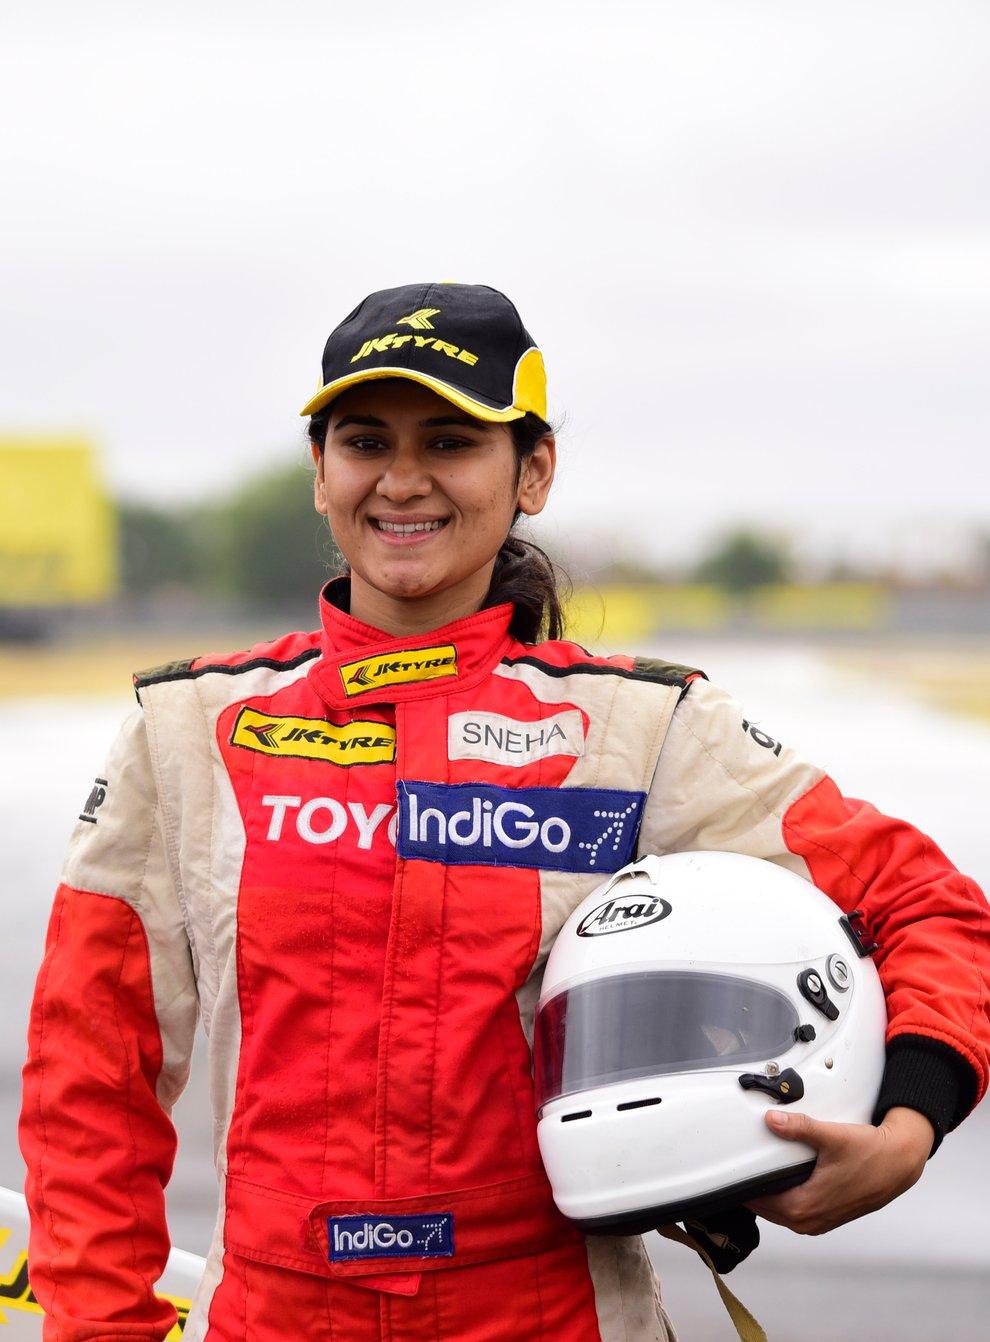 Sneha Sharma is a woman on a motorsport mission